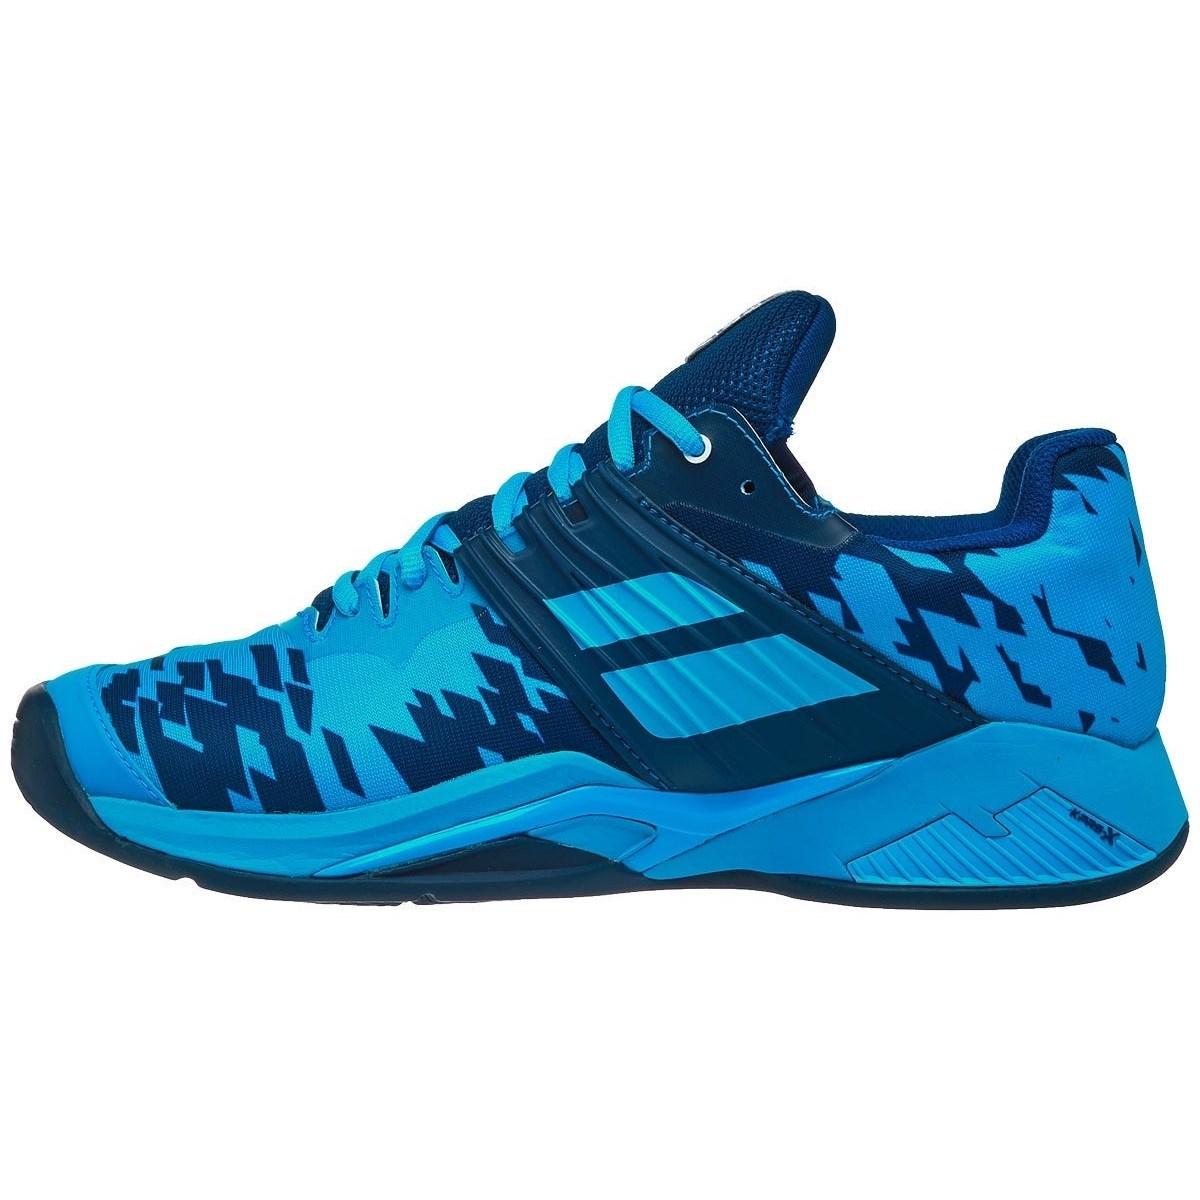 Babolat Propulse Fury Clay Mens Tennis Shoes- Blue/Navy